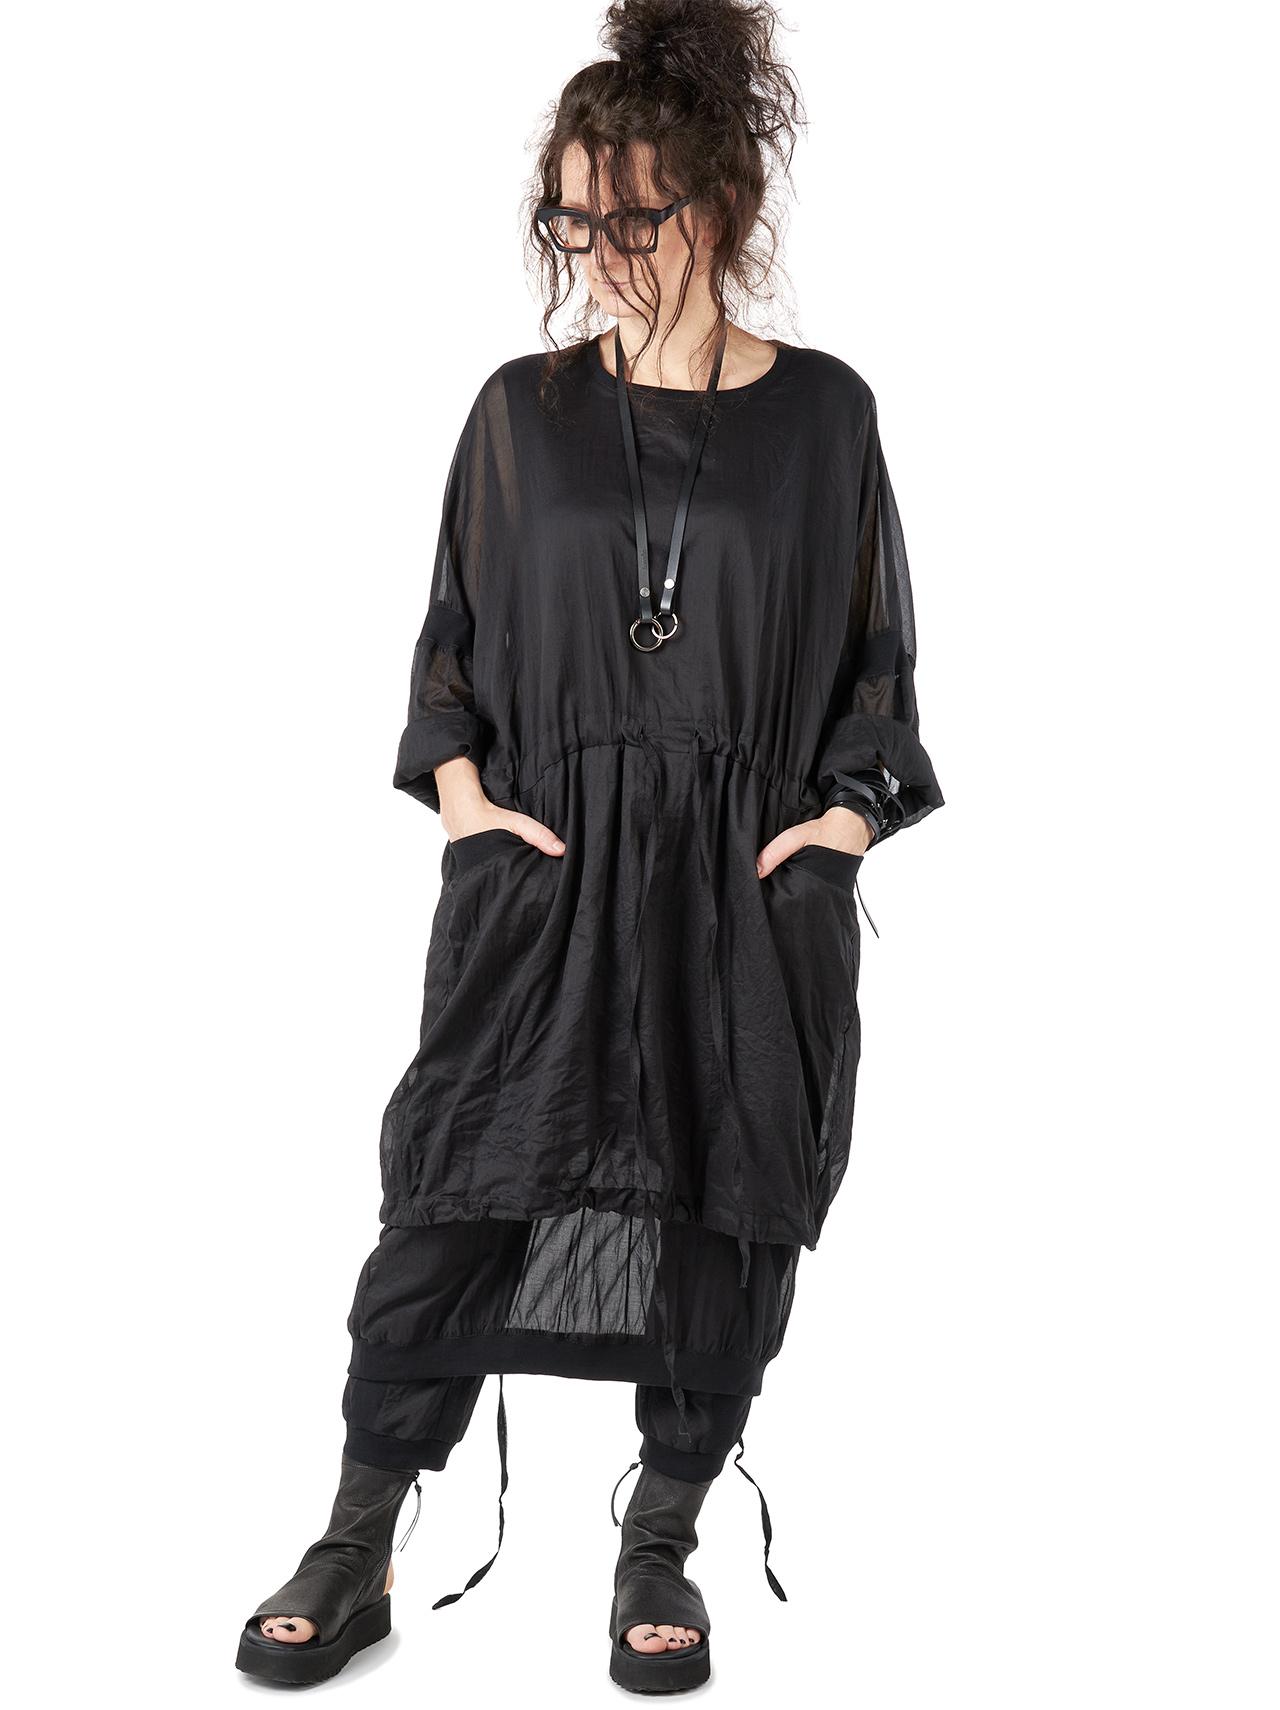 VESNYA dress